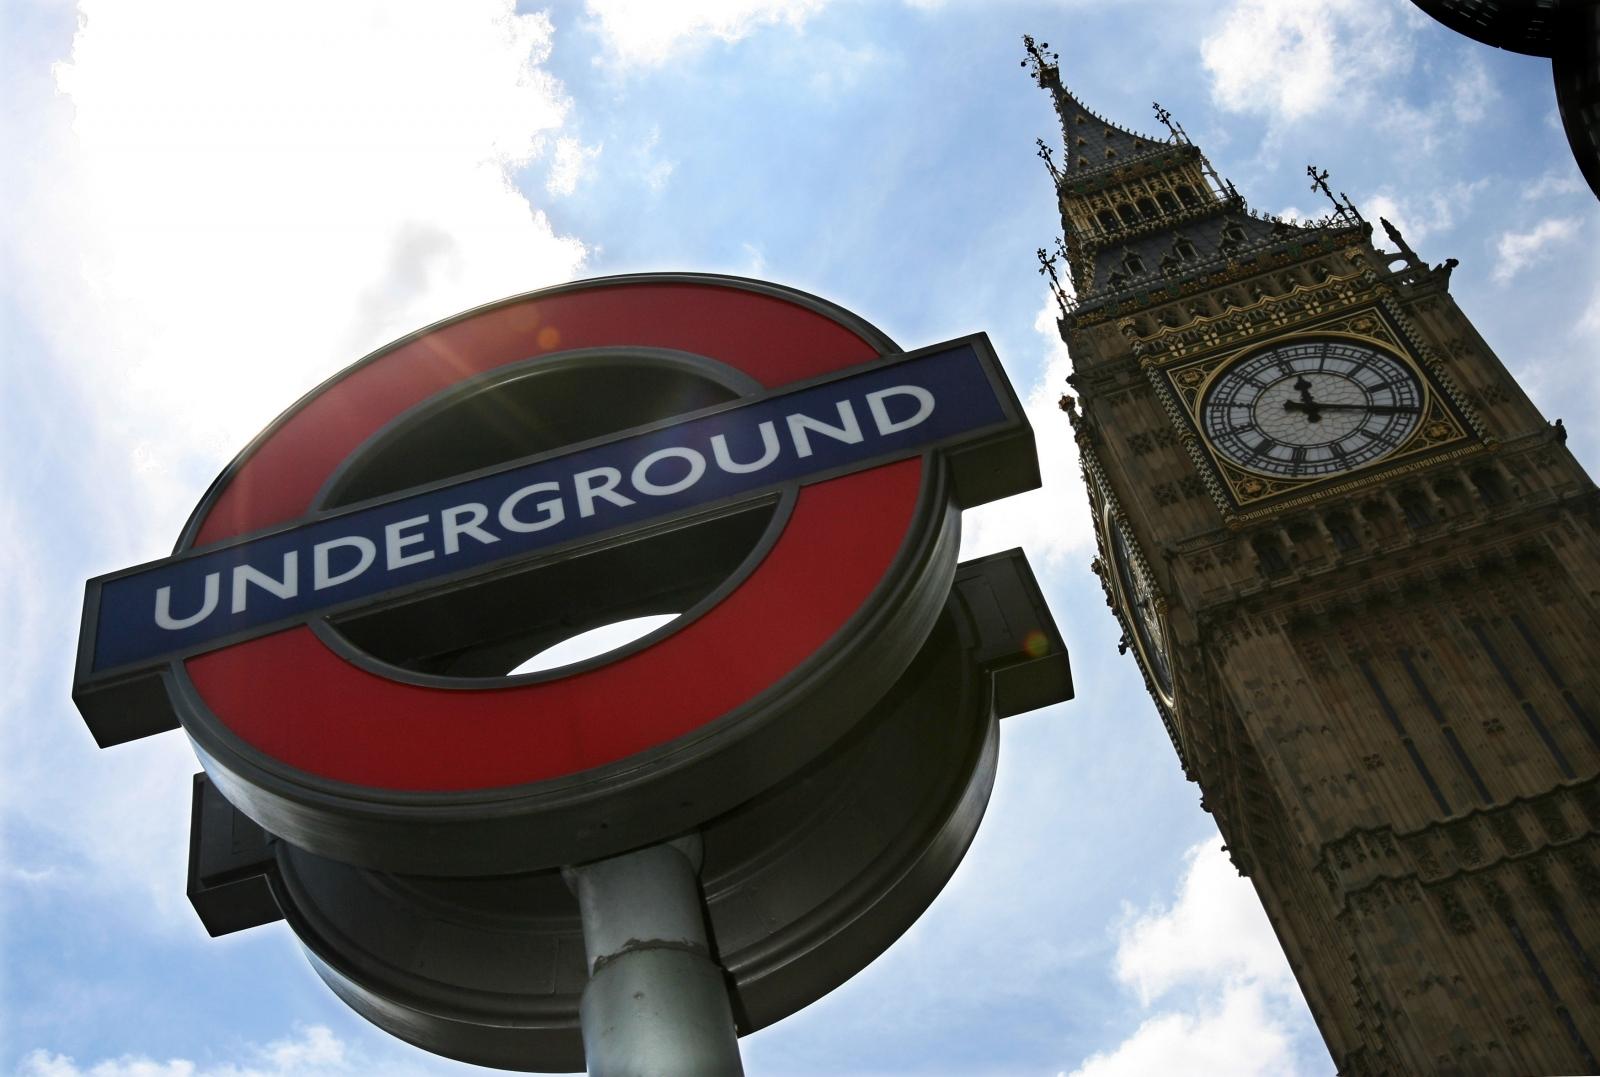 London Underground logo